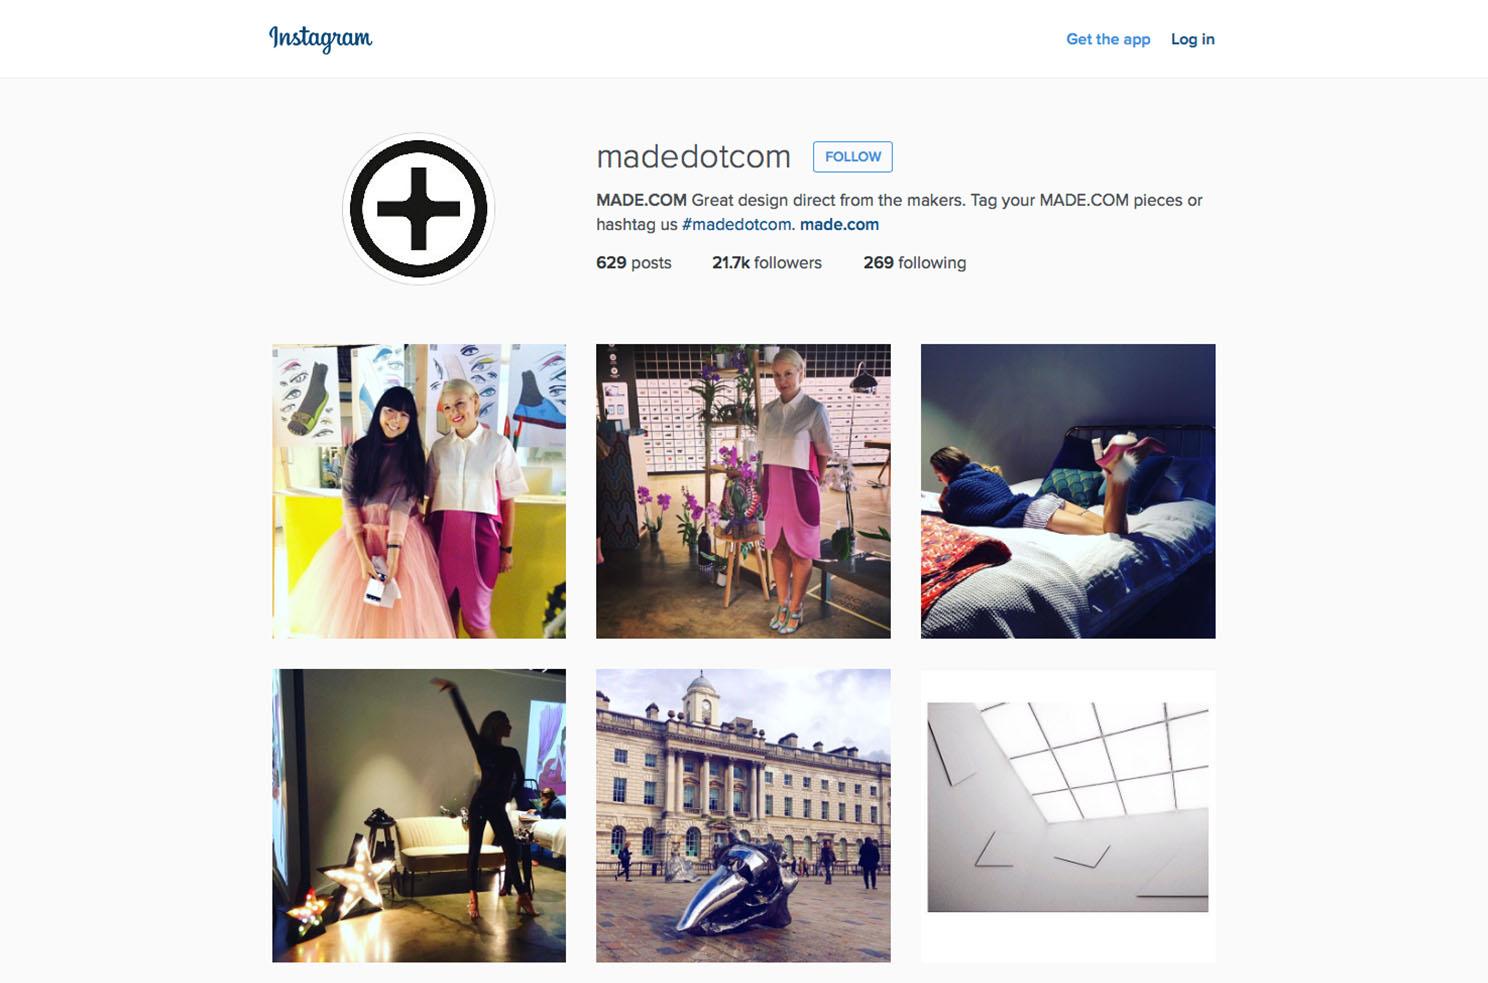 made.com instagram Marvellous digital marketing agency